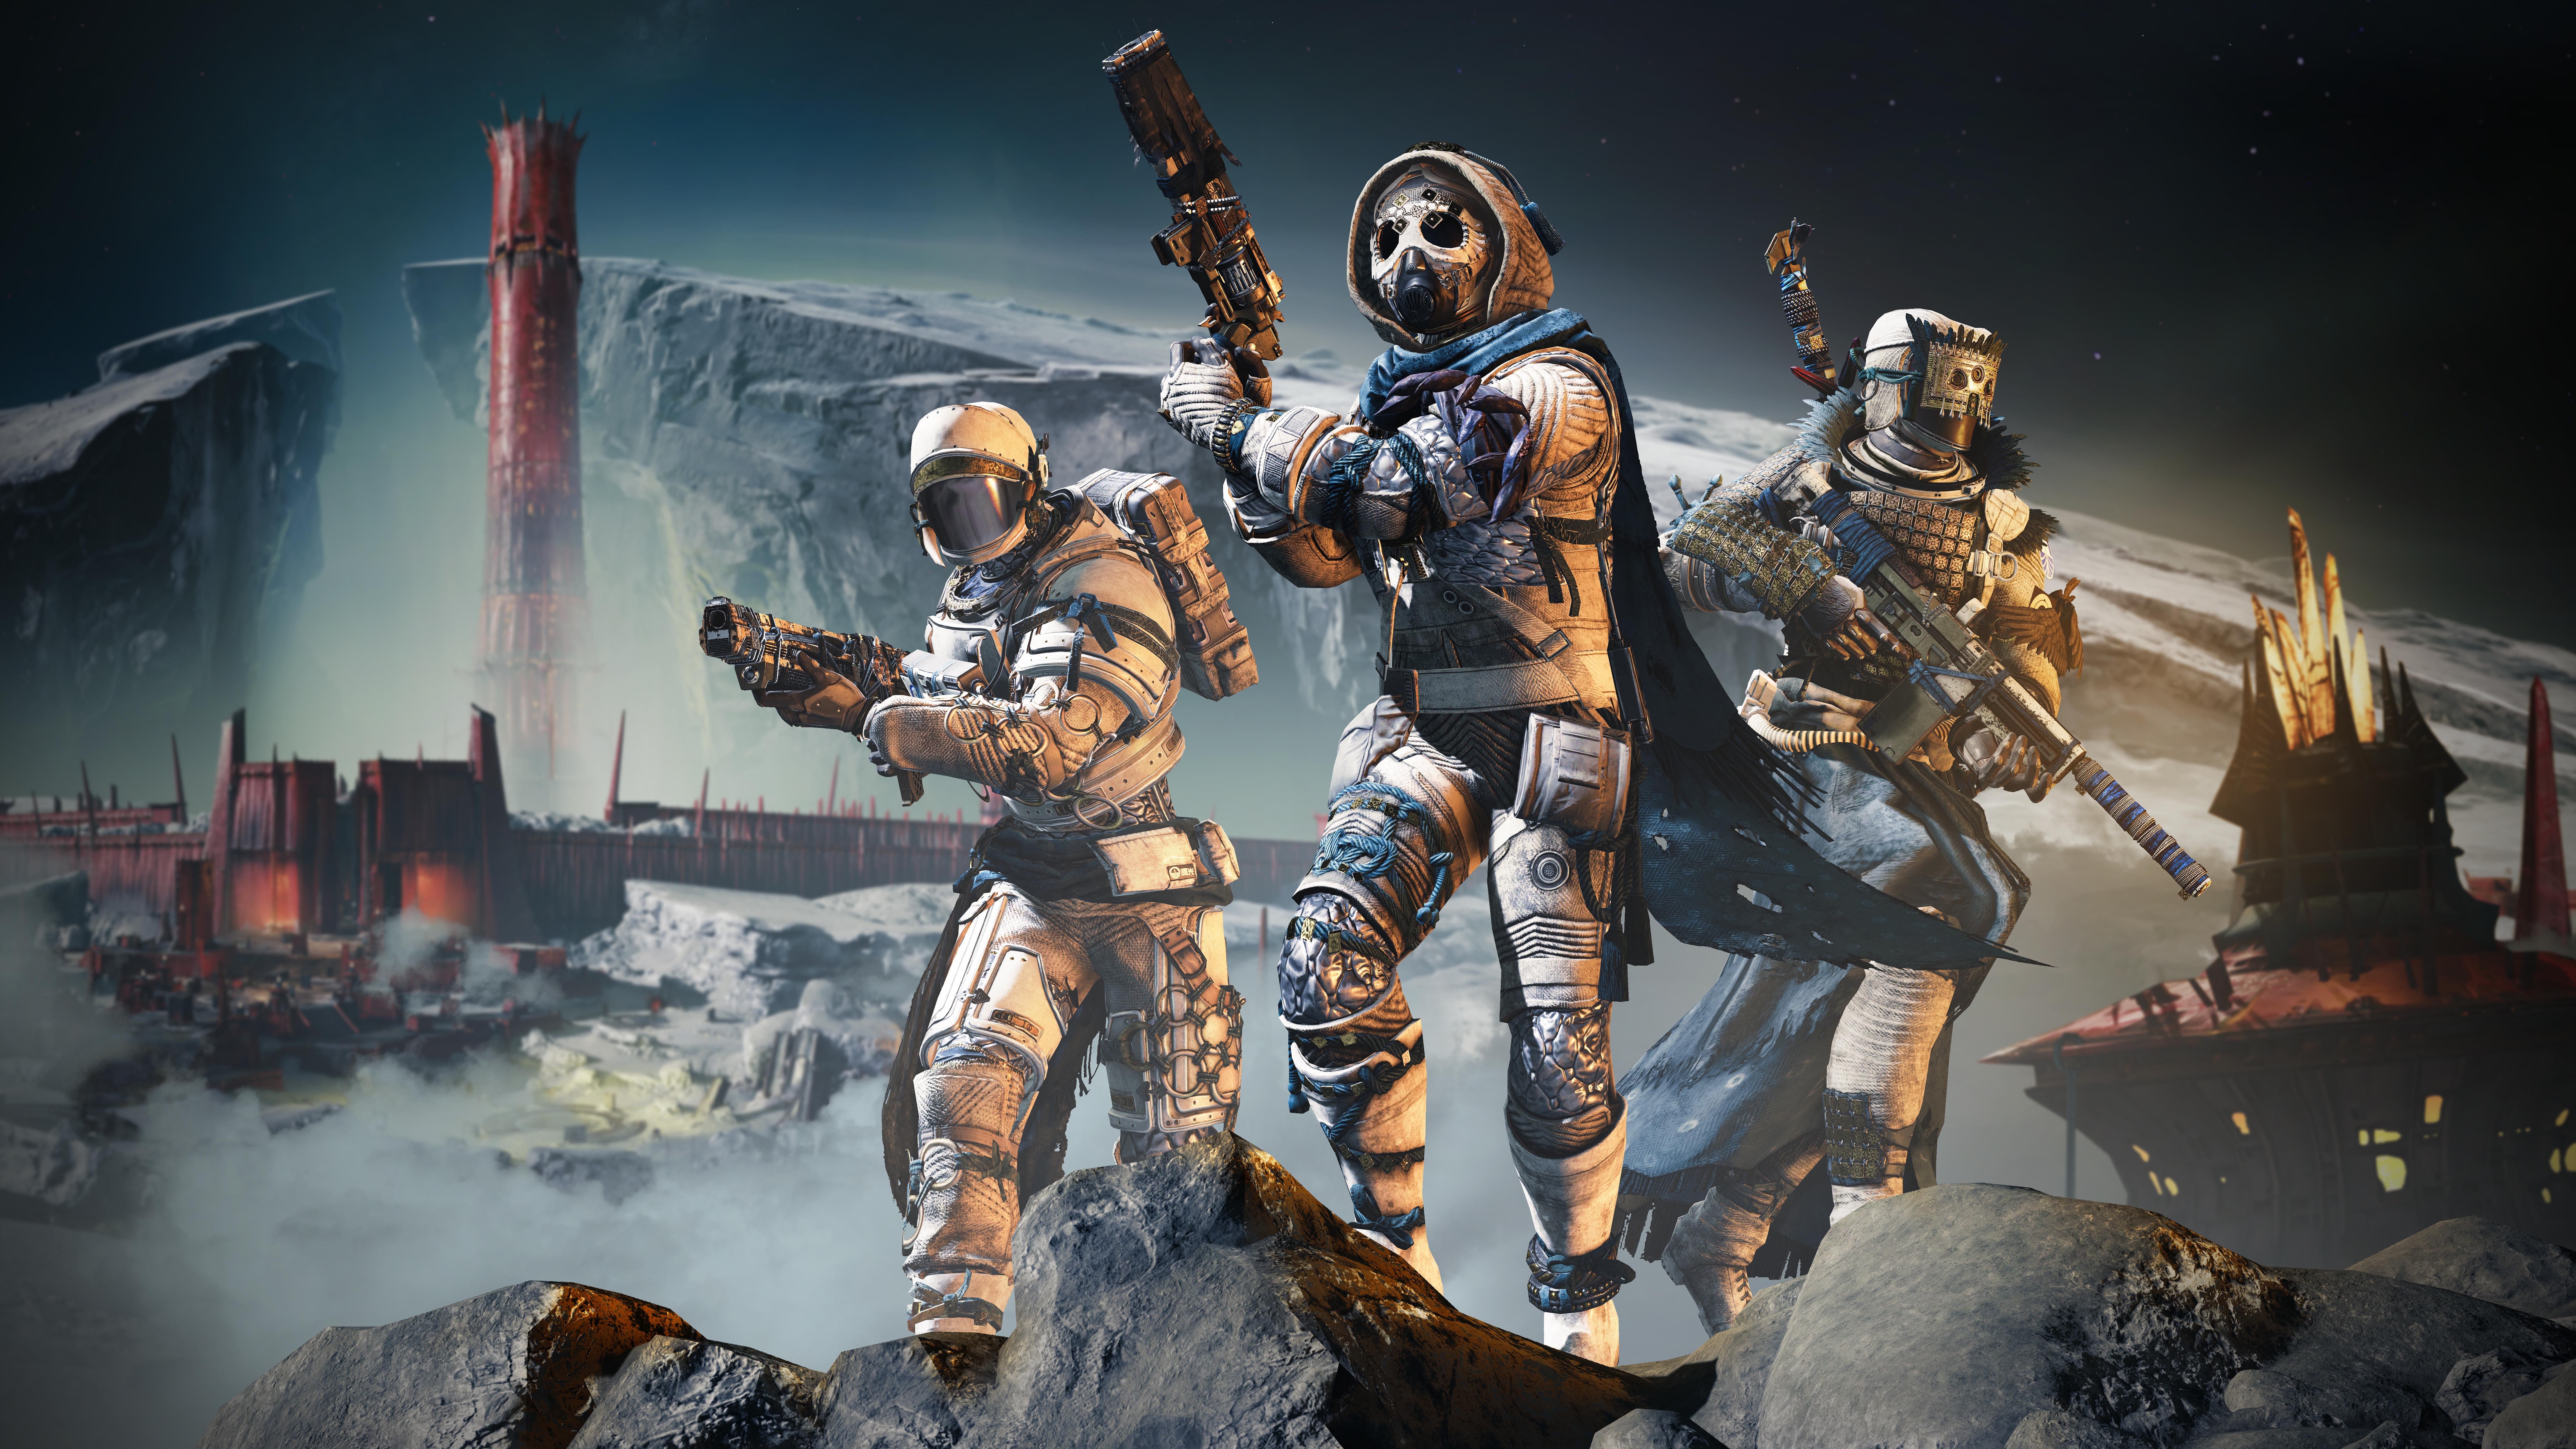 Destiny 2 Shadowkeep And New Light, HD Games, 4k ...